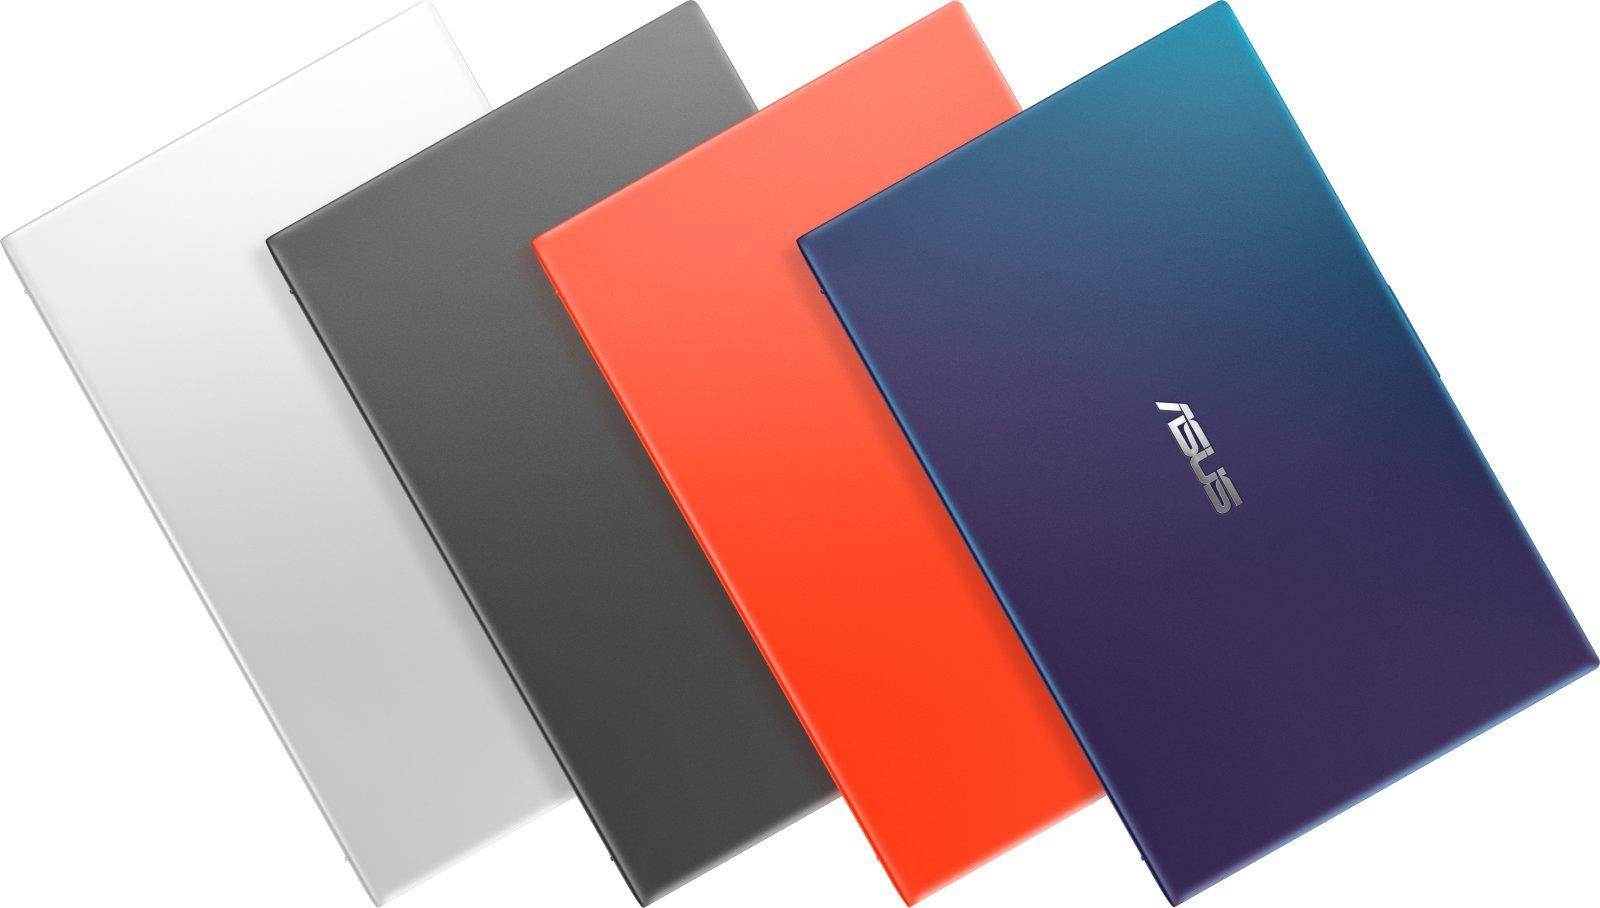 ASUS VivoBook line